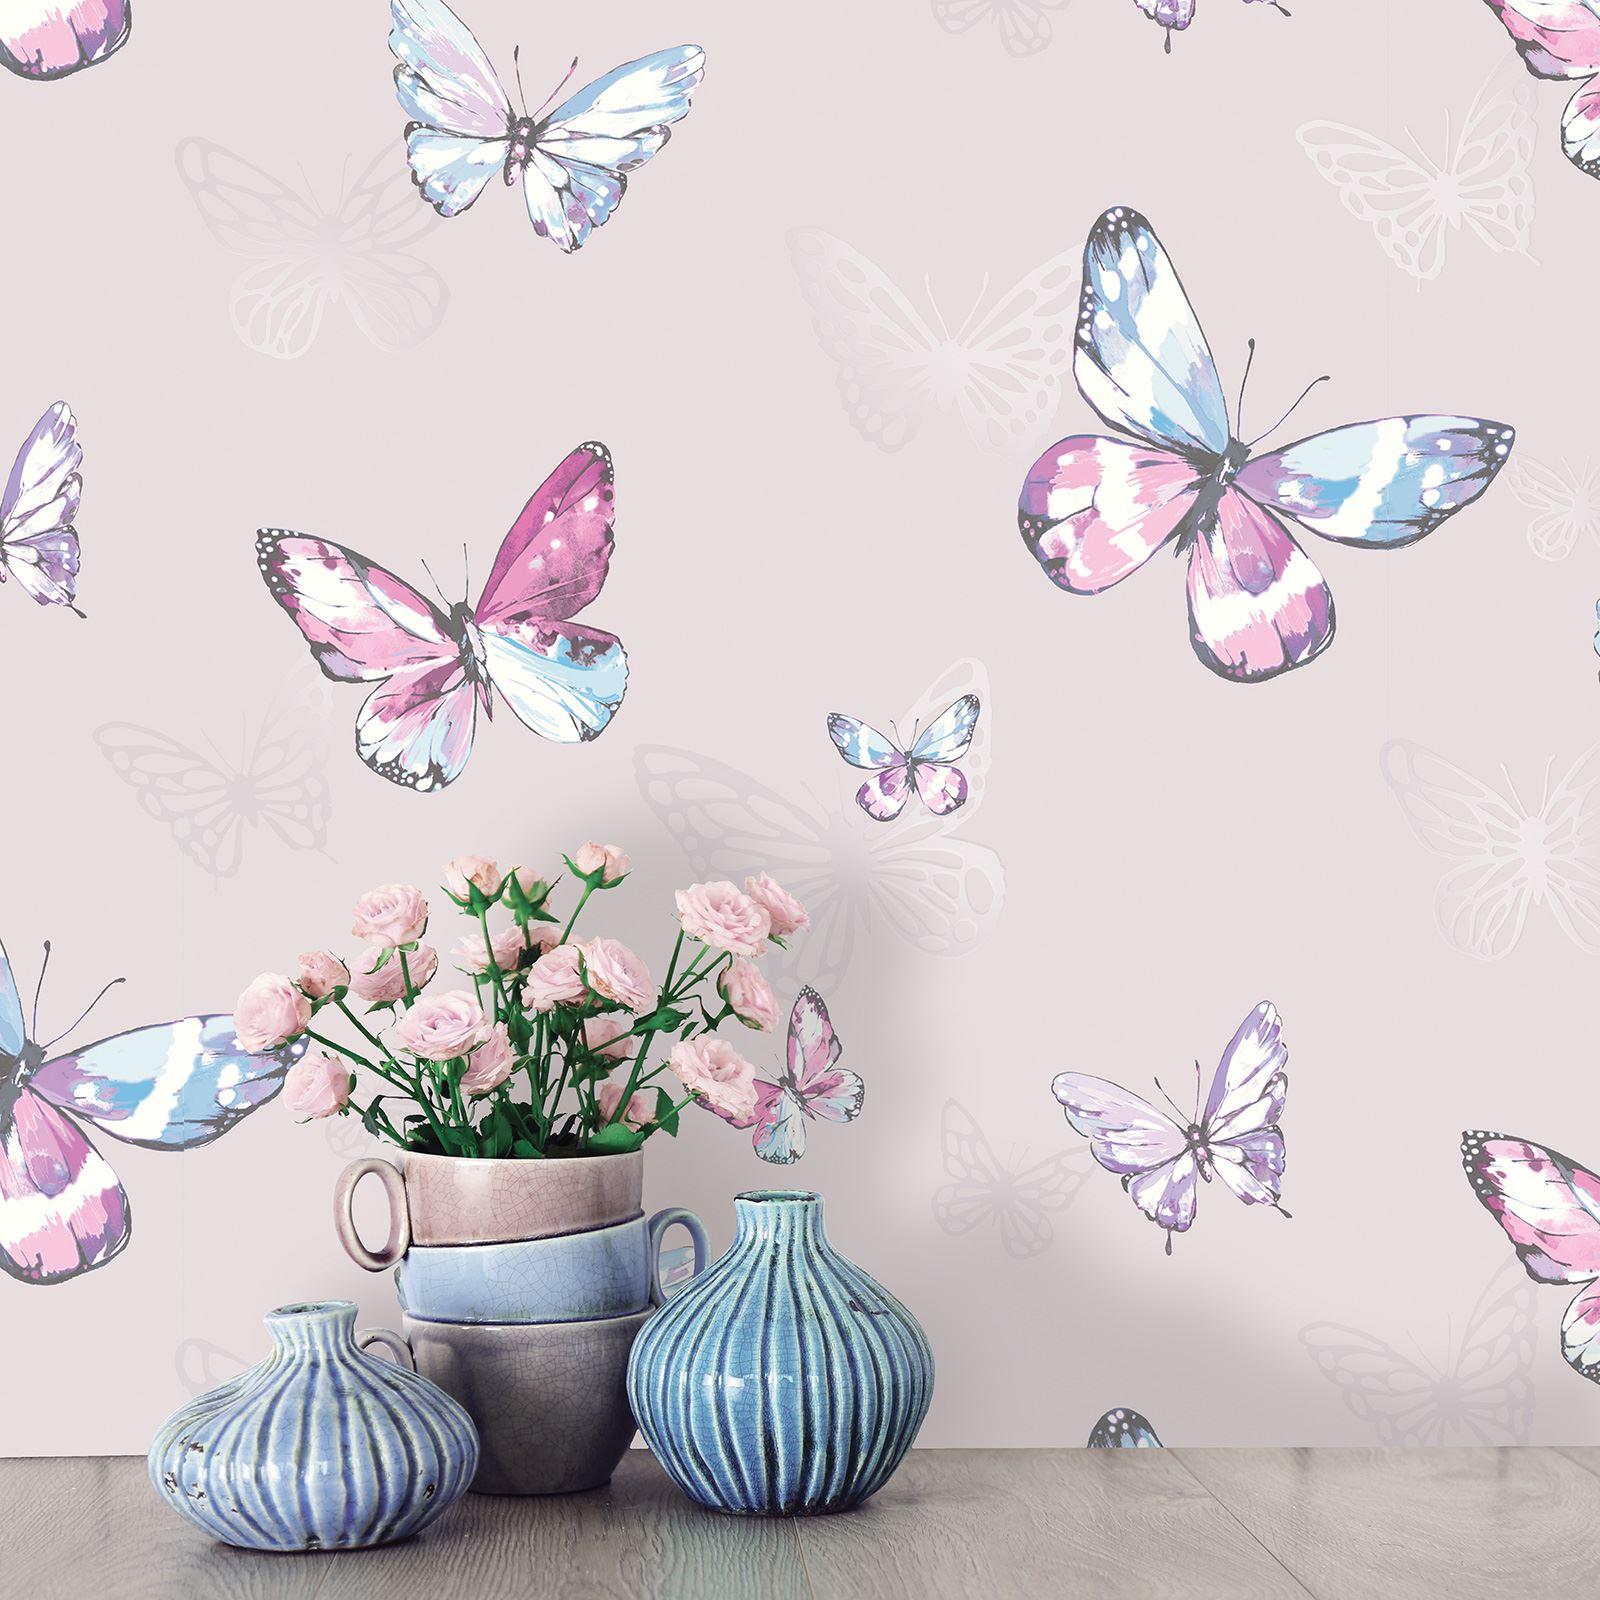 schmetterling tapete m dchen schlafzimmer dekor rosa wei t rkis lila glitter ebay. Black Bedroom Furniture Sets. Home Design Ideas